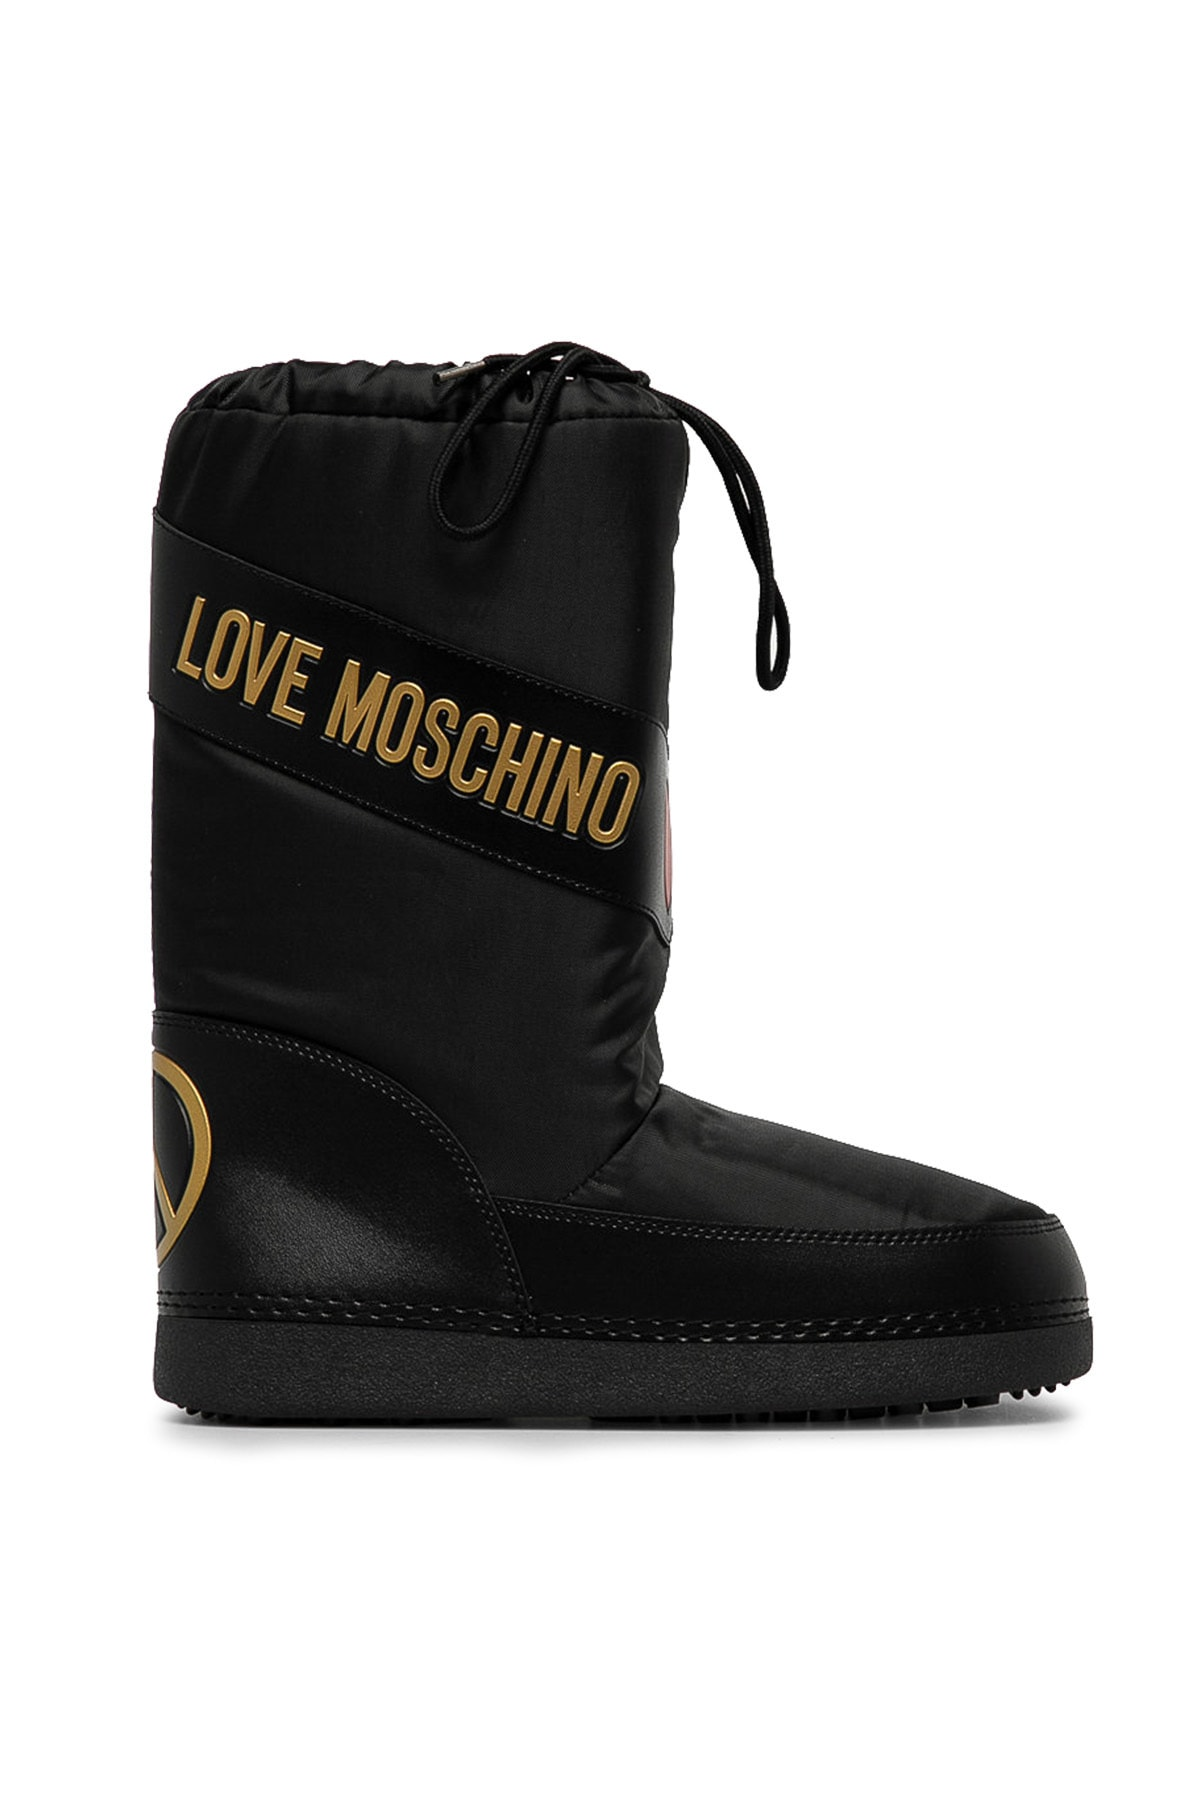 Love Moschino Kadın Bot Ja24012g0bıu3000 1